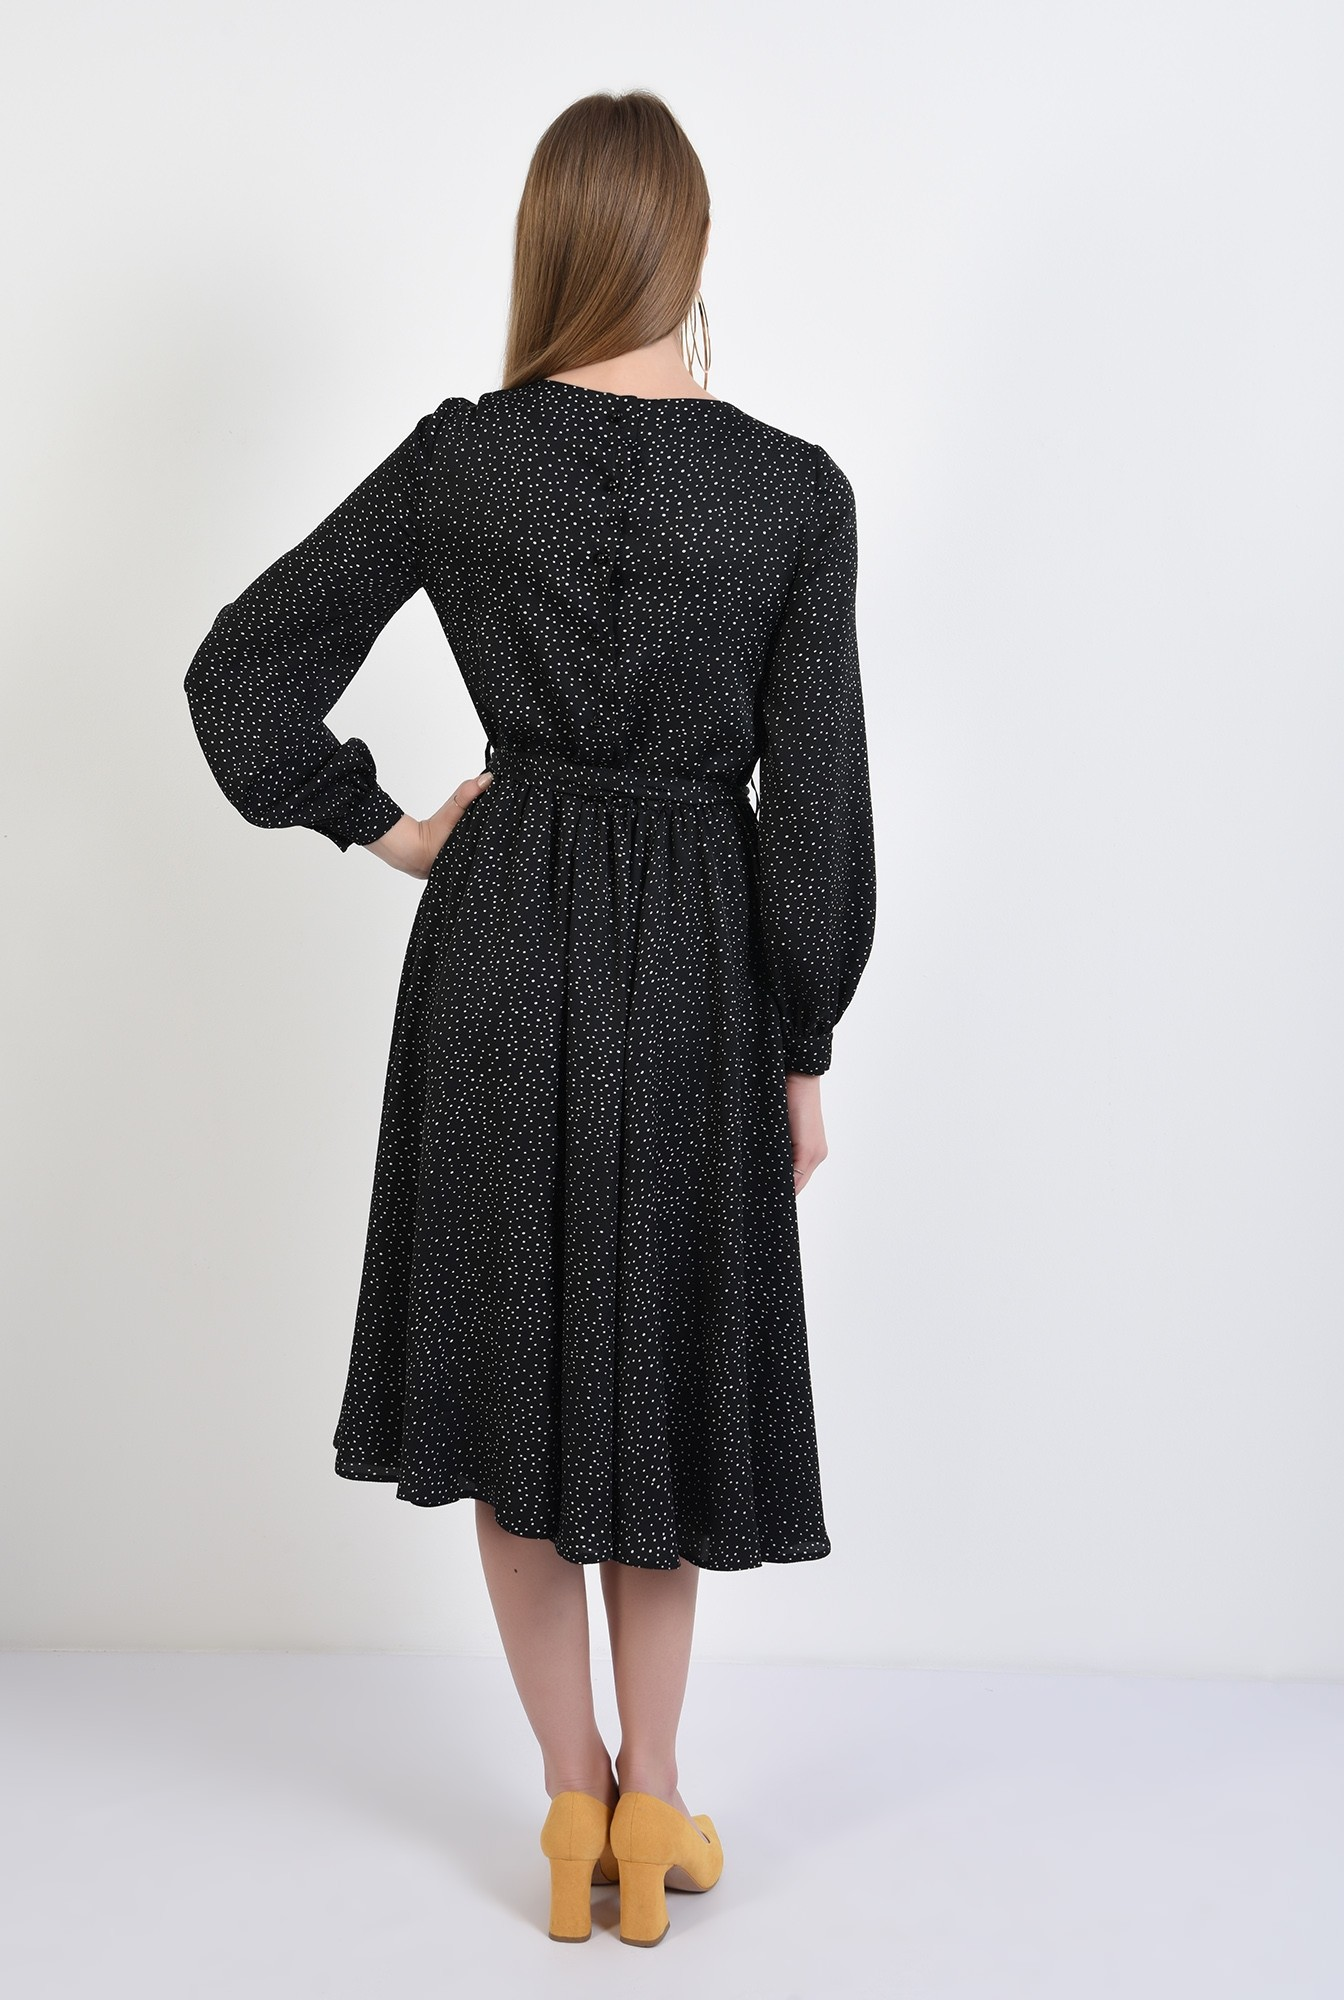 1 - 360 - rochie midi, cu picouri, satin imprimat, clos, rochie de primavara